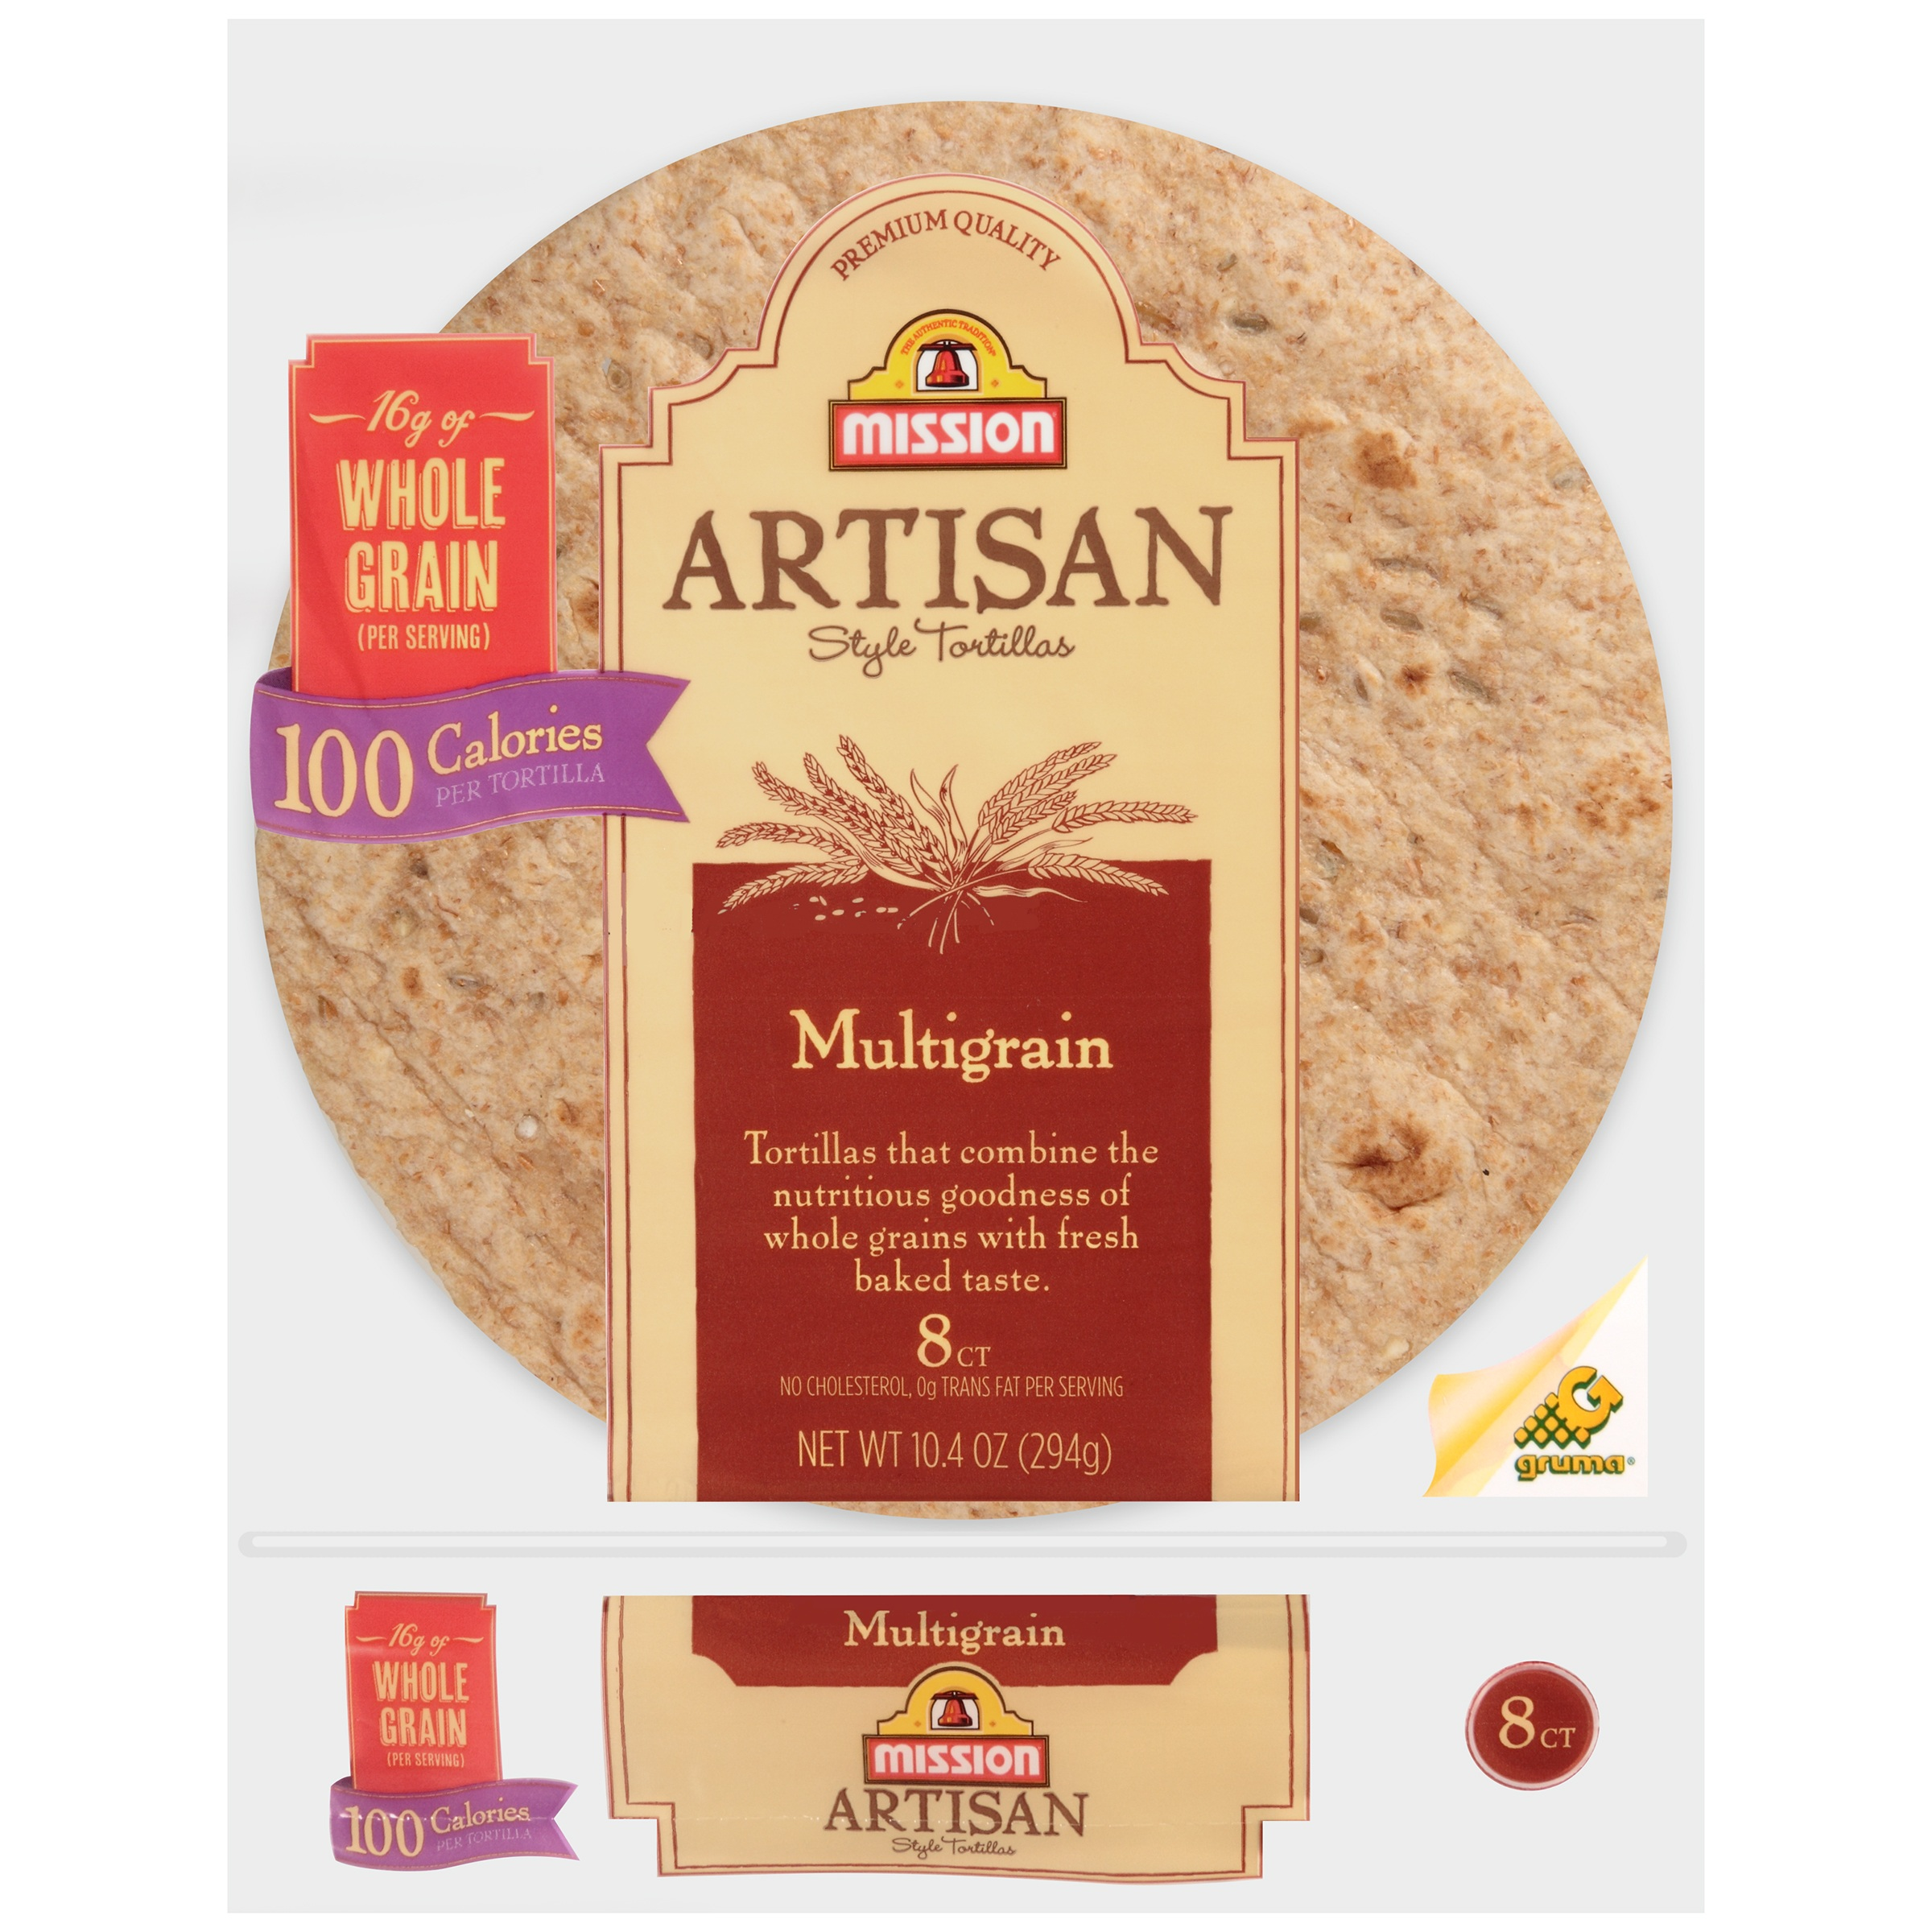 Mission® Artisan Style Multigrain Tortillas 10.4 oz. Bag